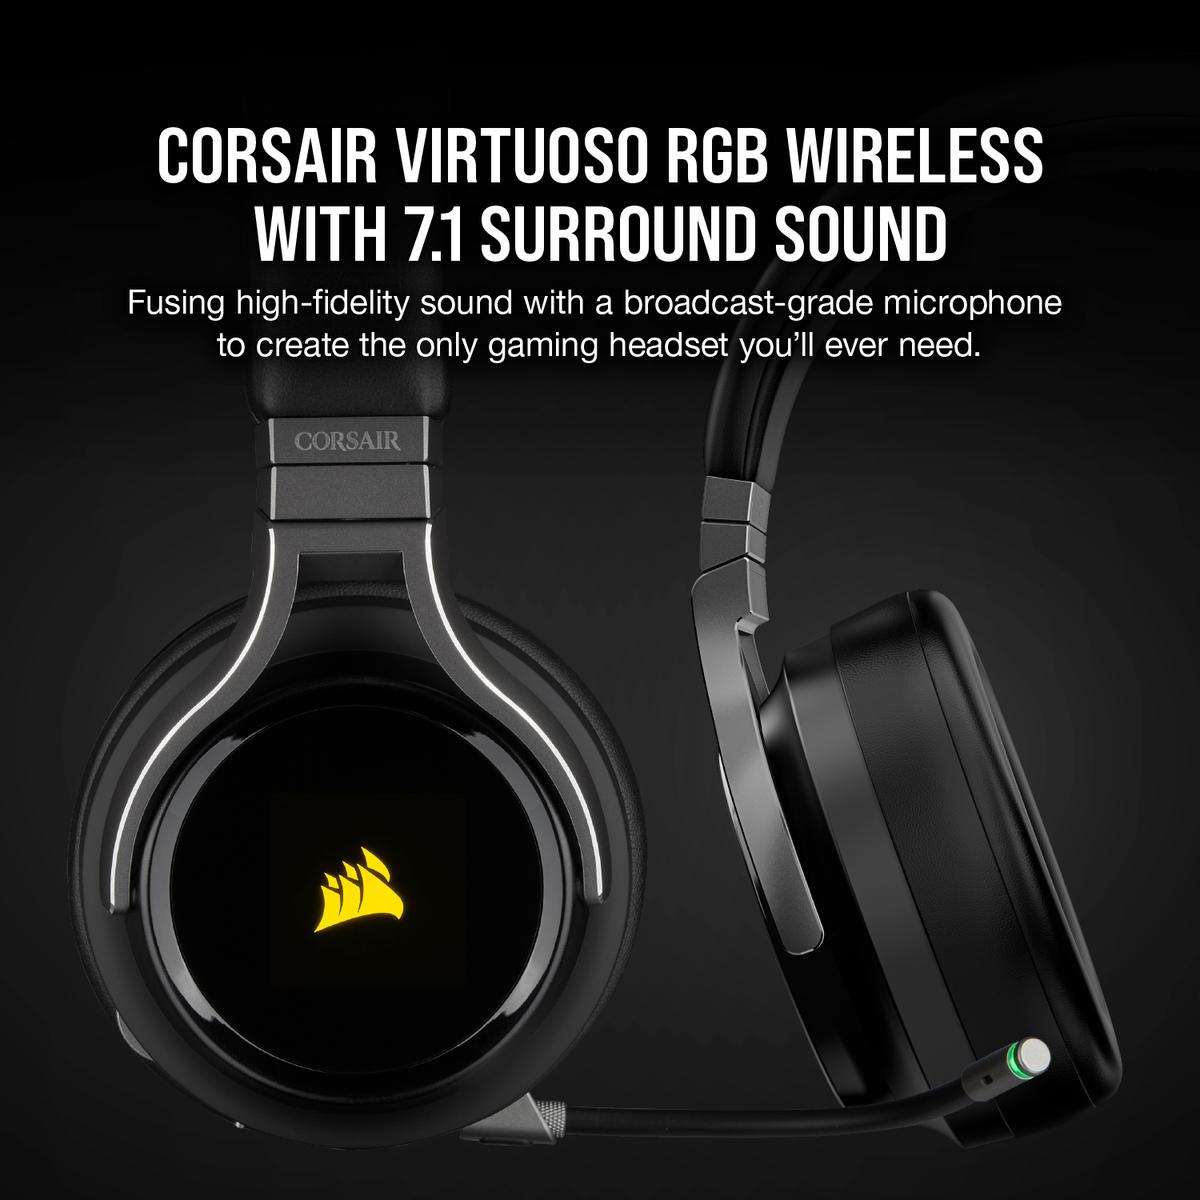 Corsair Virtuoso RGB Wireless Gaming Headset สีดำ ของแท้ ประกันศูนย์ 2ปี (Black)